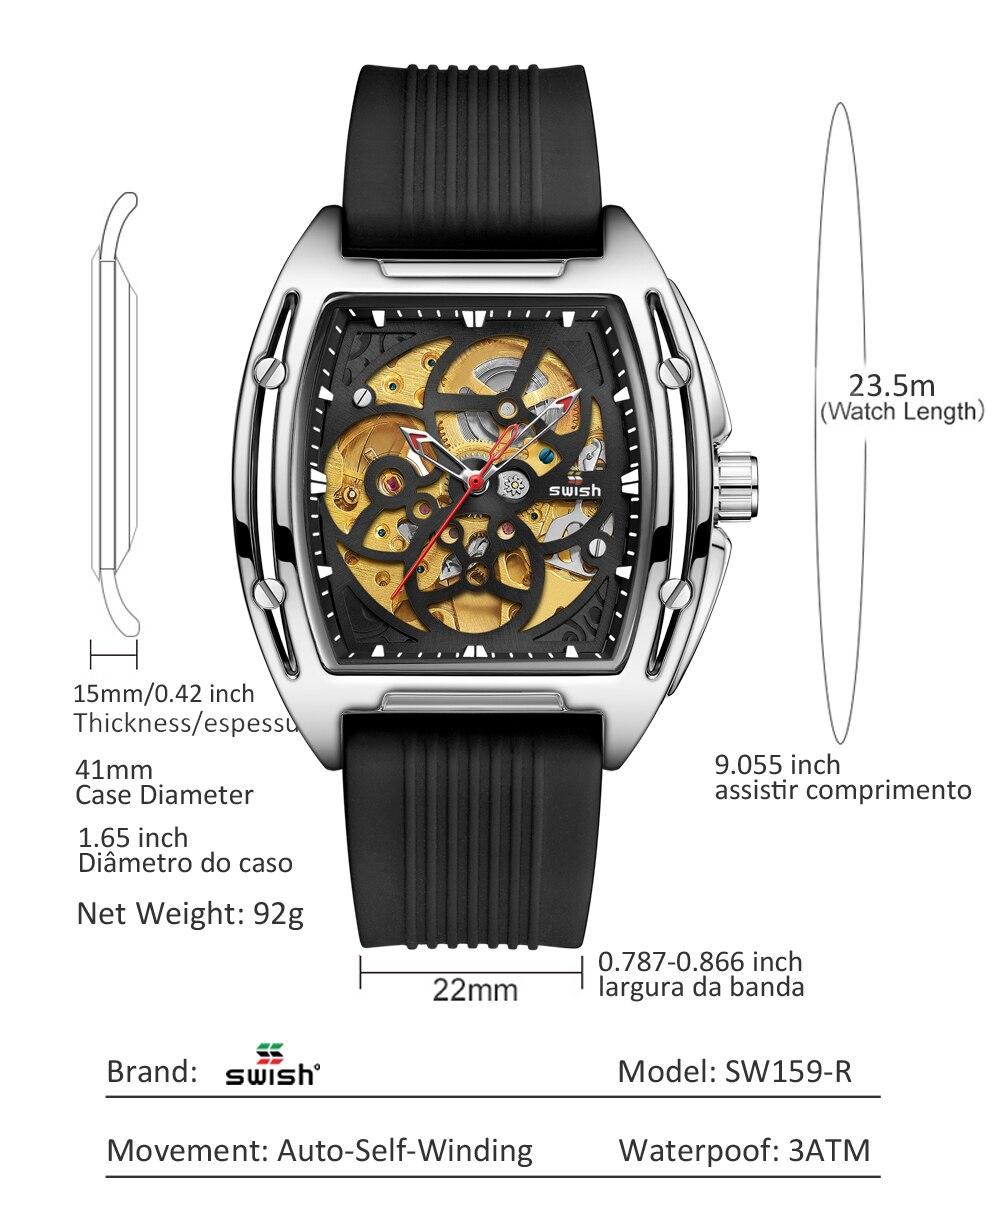 H95691c7062c64b549384178fbc30a842z SWISH Brand Design Luxury Men's Mechanical Wristwatch